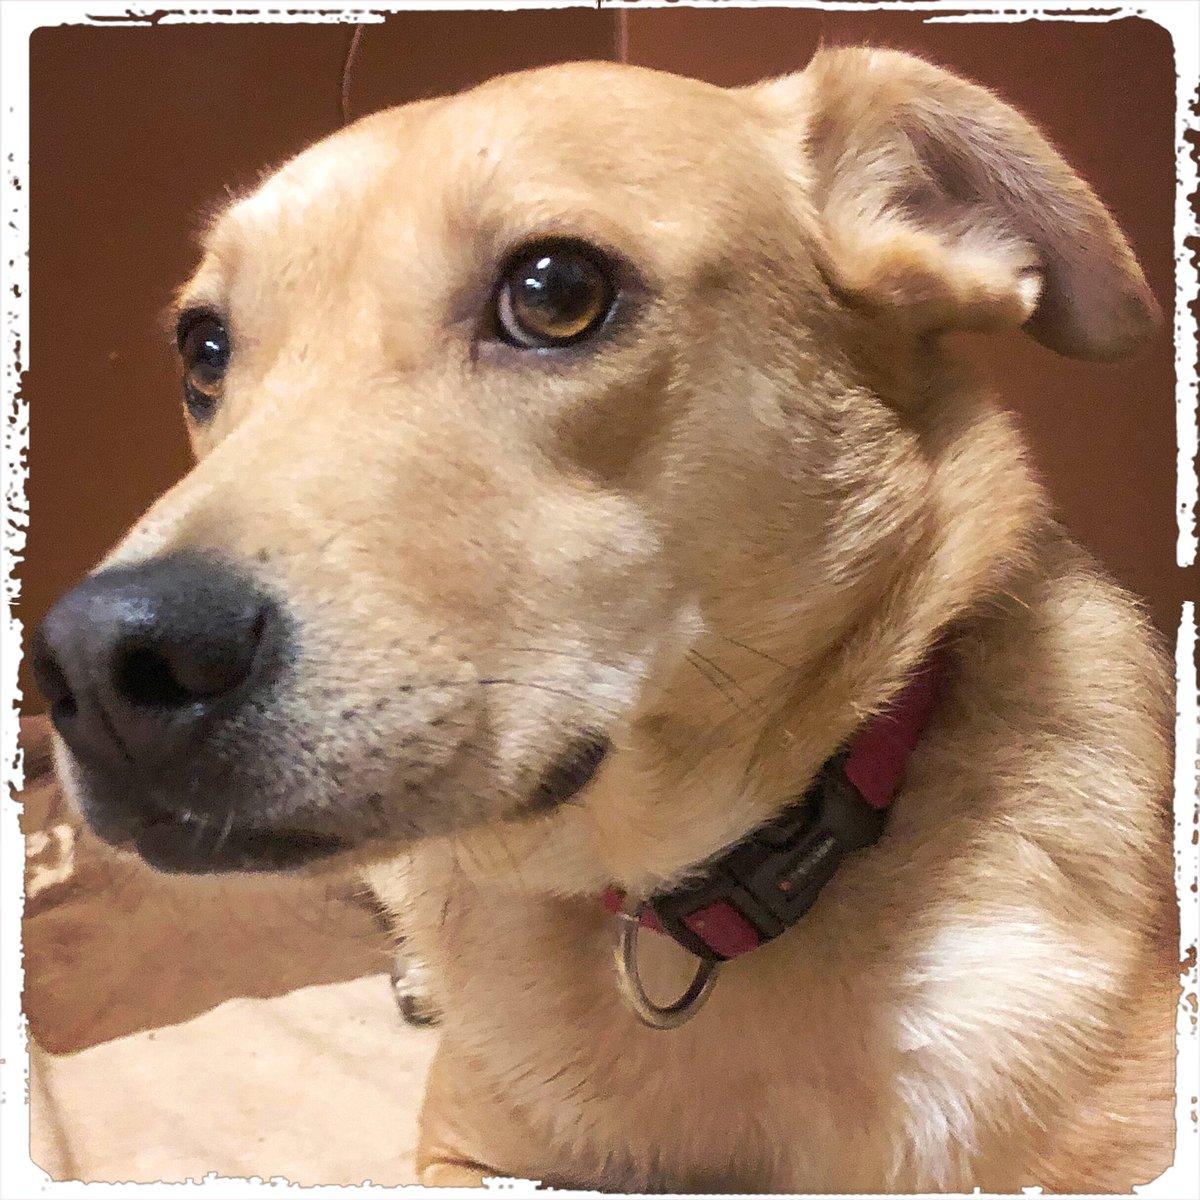 Trixi wishes you a nice day  . .  #doglover #ilovemydog #instadog  #meinhund #dogs_of_world #dogsearth #puppies #hund #hundeliebe #hundeleben #dogislove #trustrespectlove #hundeland #hundeliebe #hundeleben #hundeblog #fellnase #besterhund #dogsneeddogs #doggy #dogspic.twitter.com/6fL4CEjVI2